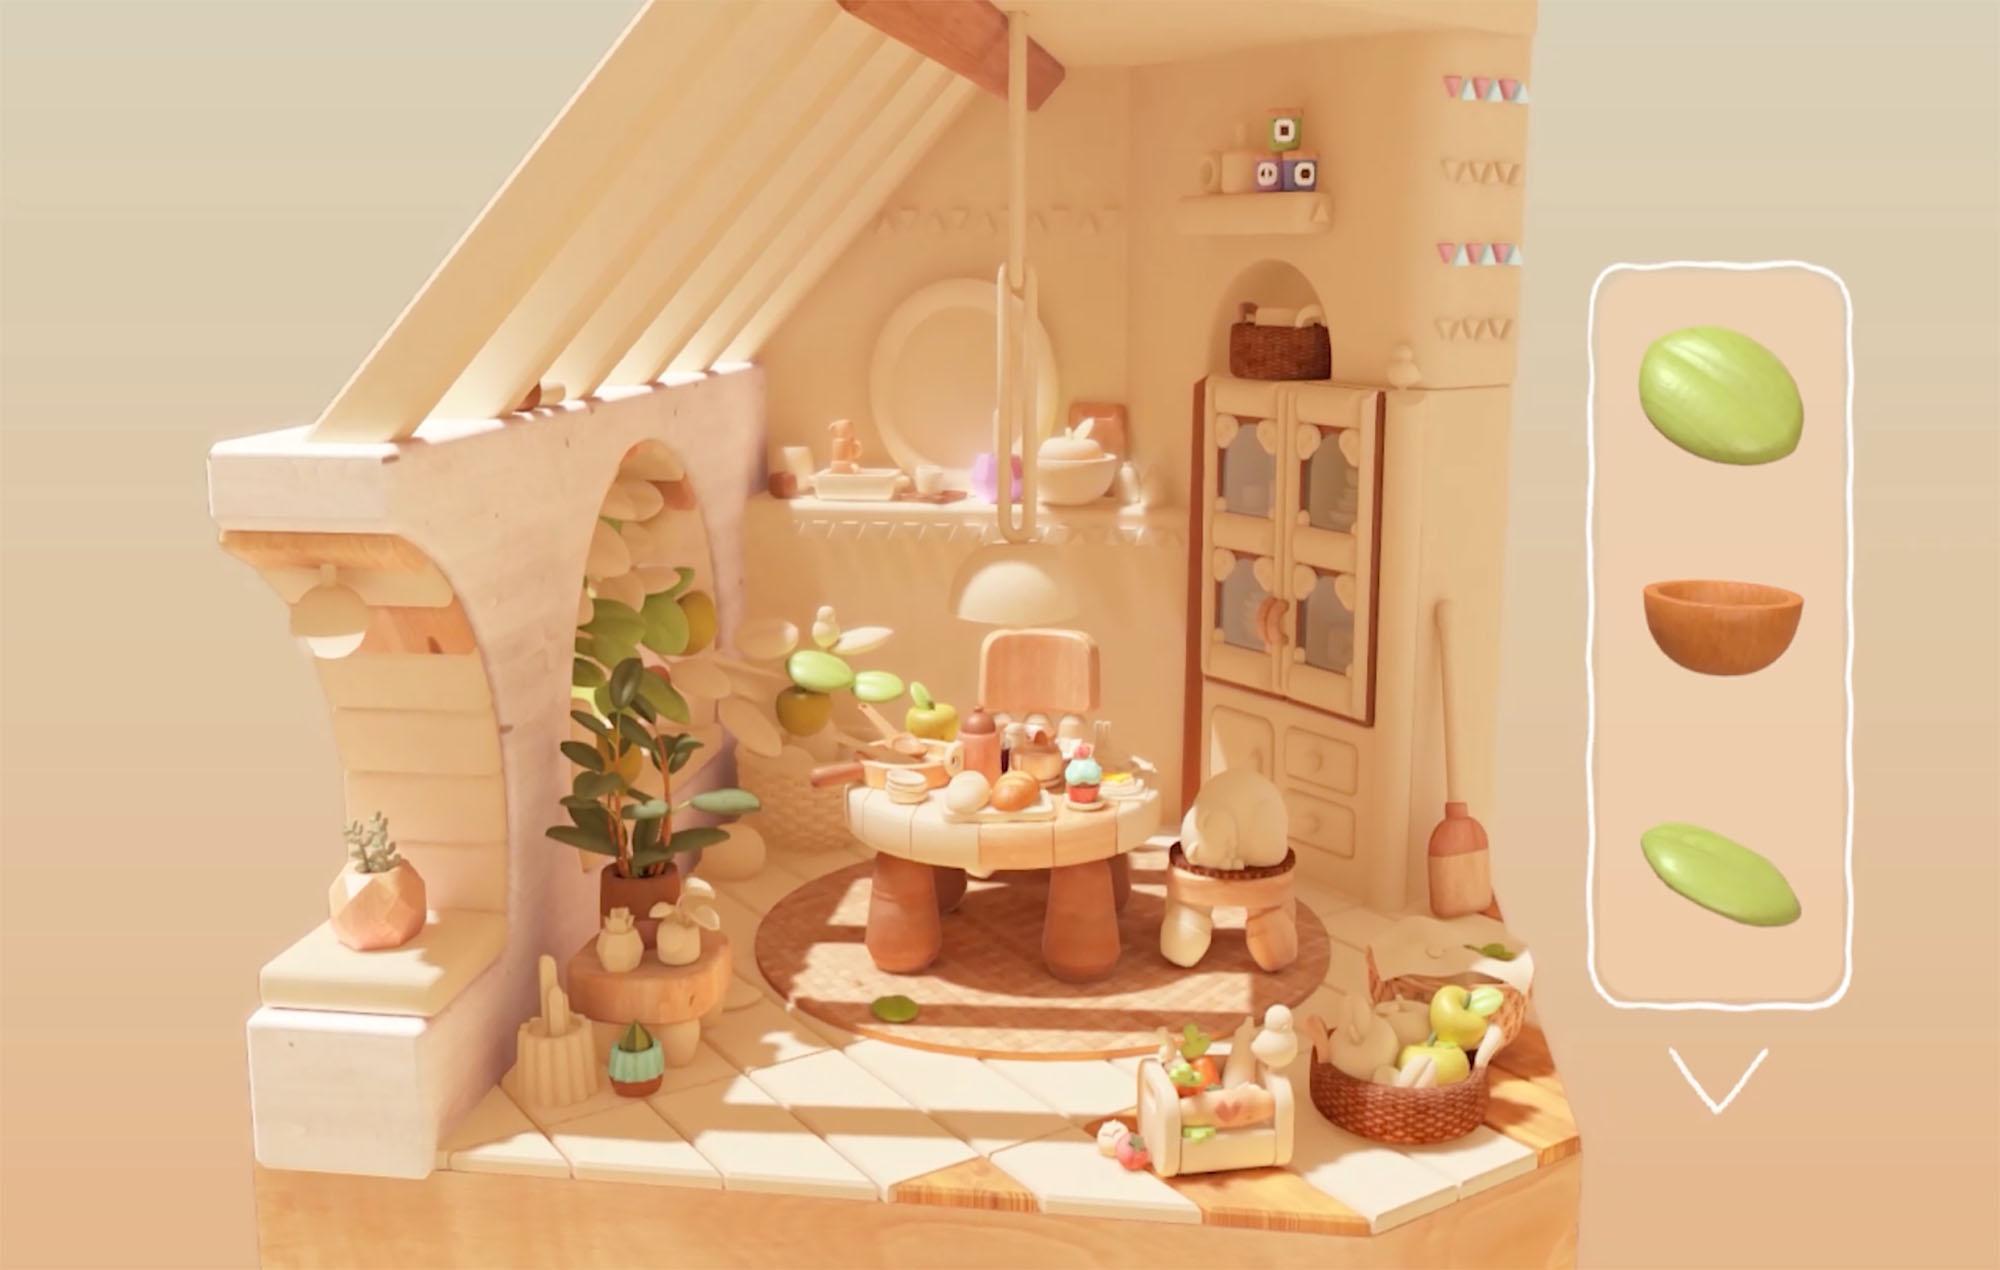 Woodo, a wholesome game. Image credit: Yullia Prohorova